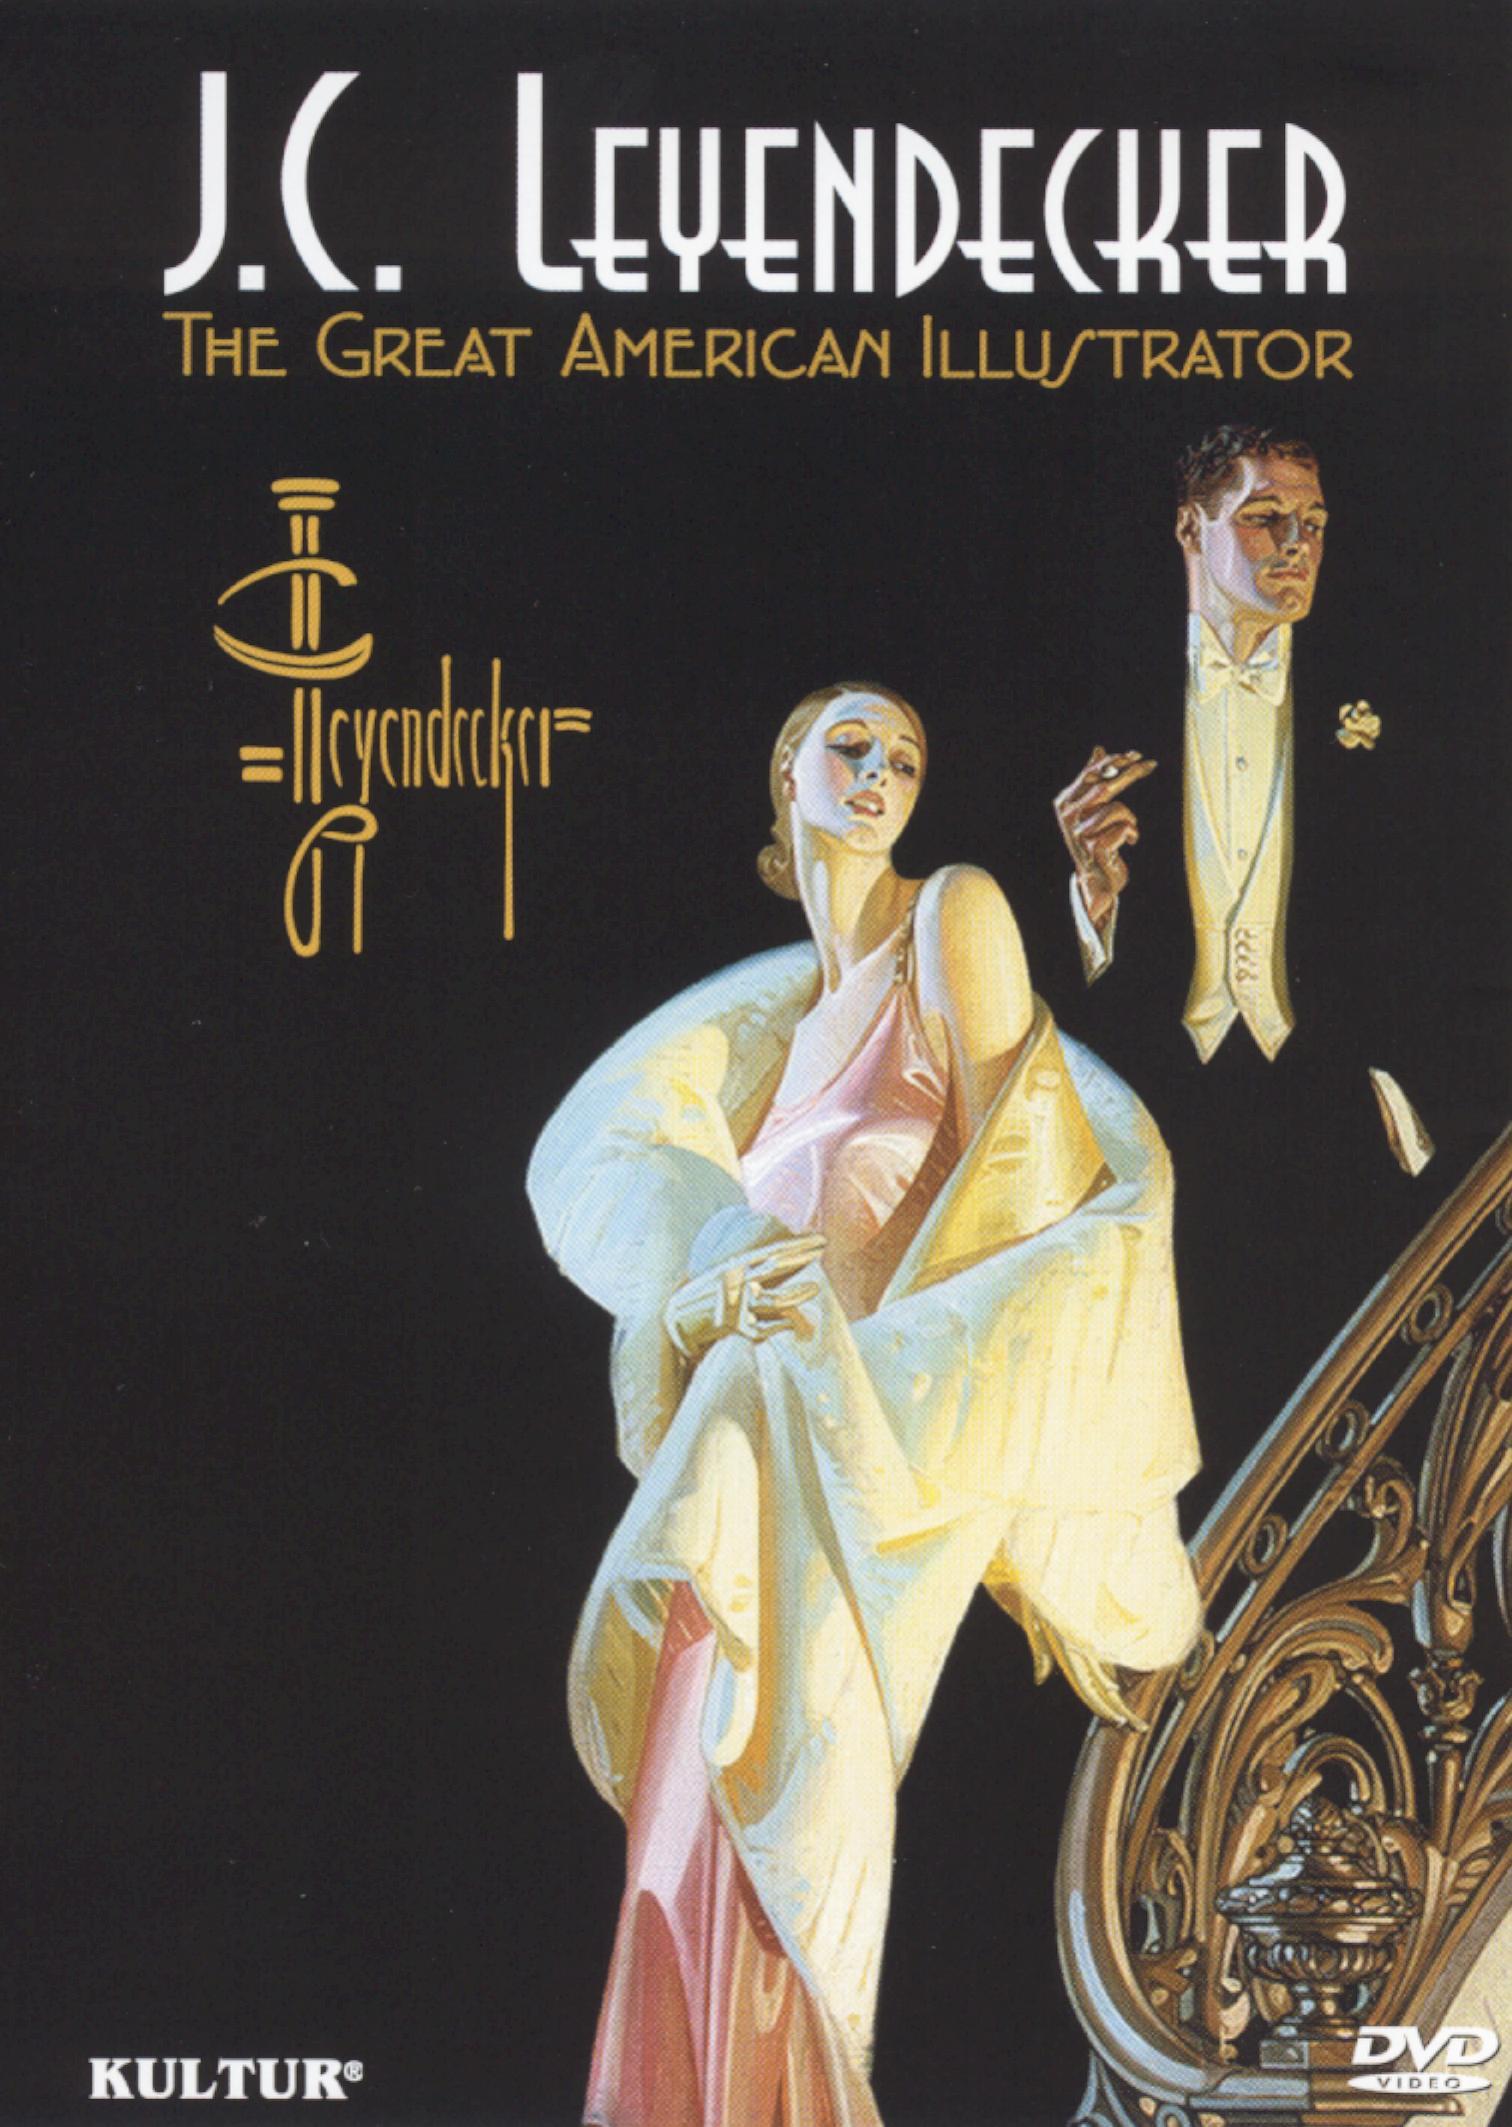 J.C. Leyendecker: The Great American Illustrator